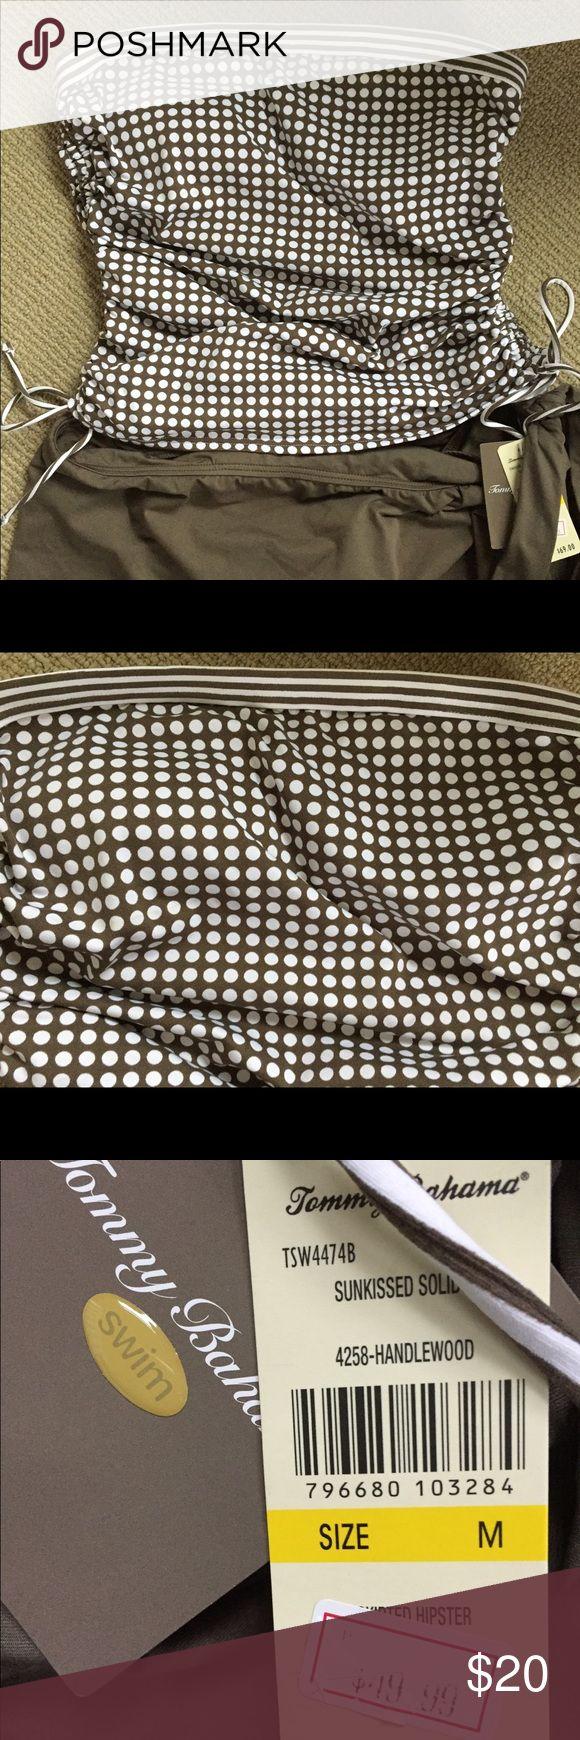 Tommy Bahama tankini. NWT. Olive and white Tommy Bahama tankini. Strapless polka dot top with solid skirted bottom. Never worn. NWT. Tommy Bahama Swim Bikinis